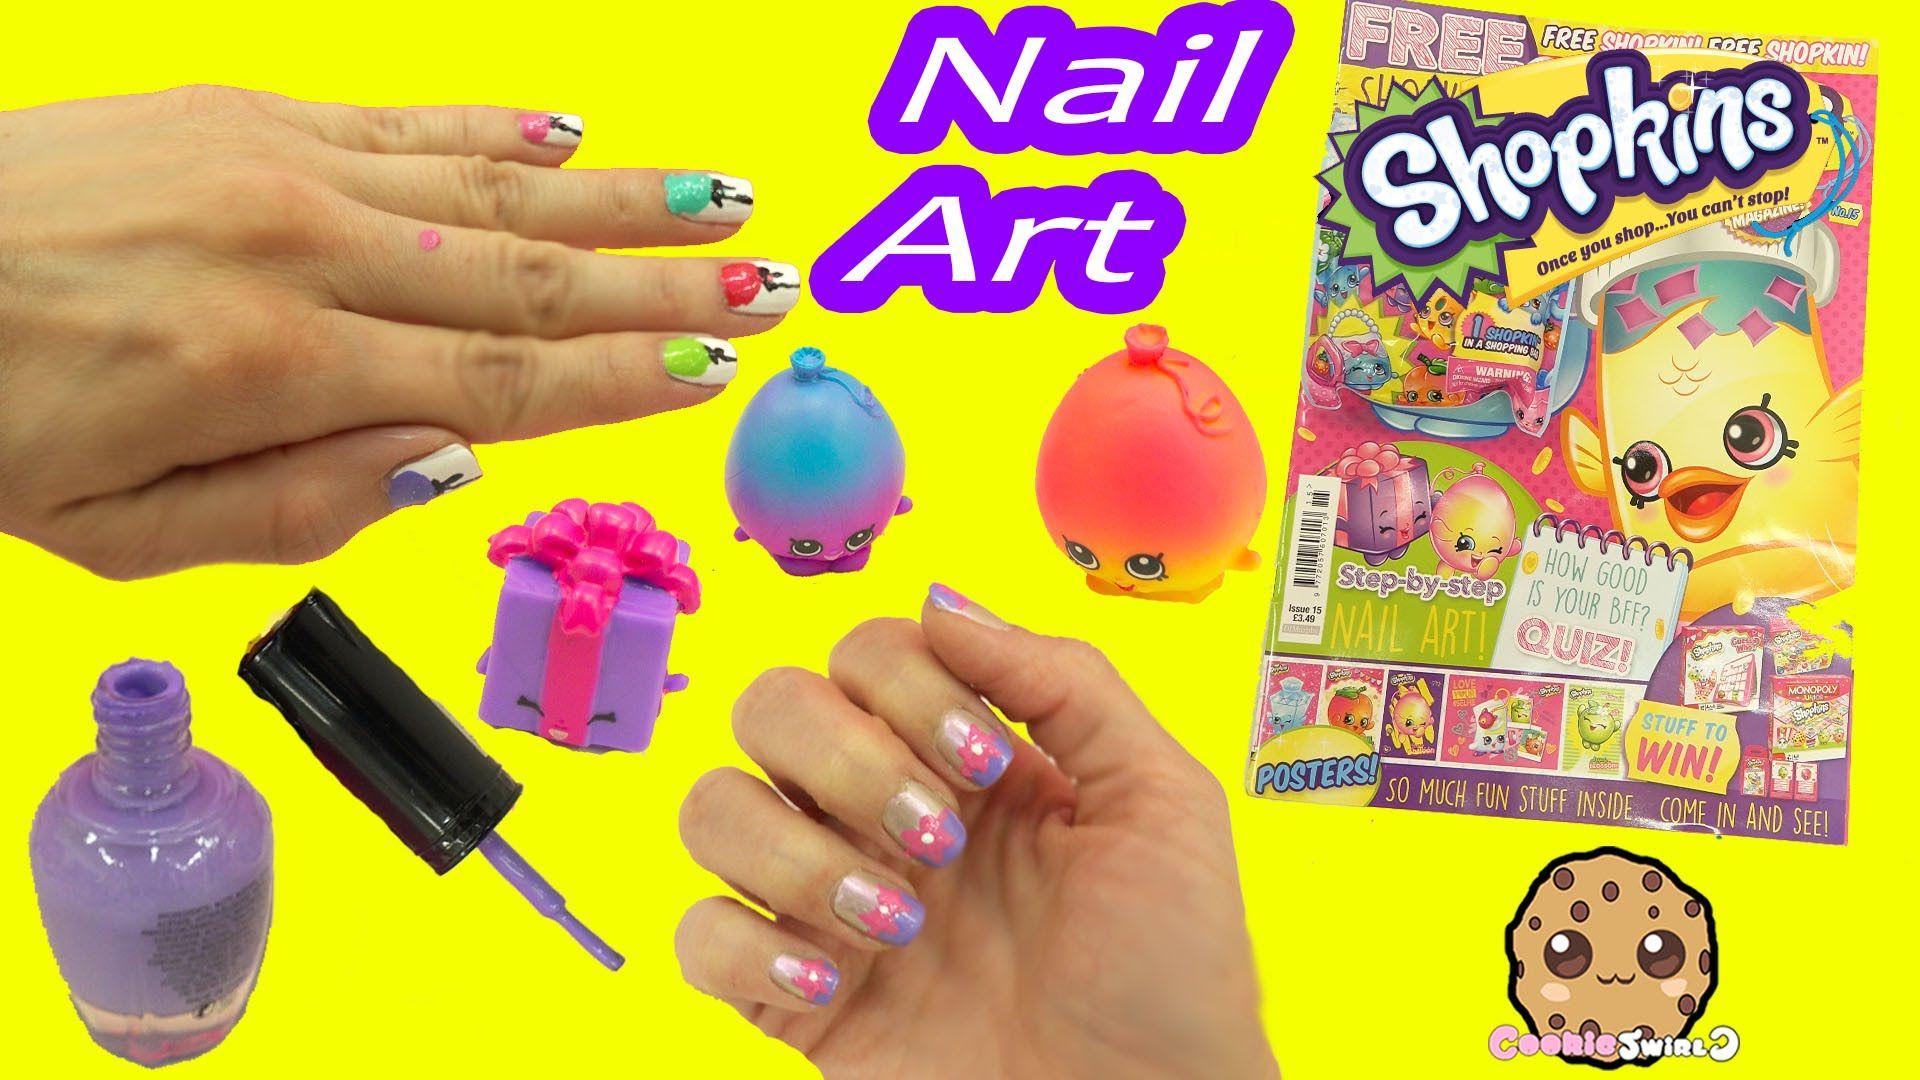 Nail Art Fail Shopkins Official Magazine Nail Art Nail Polish Step